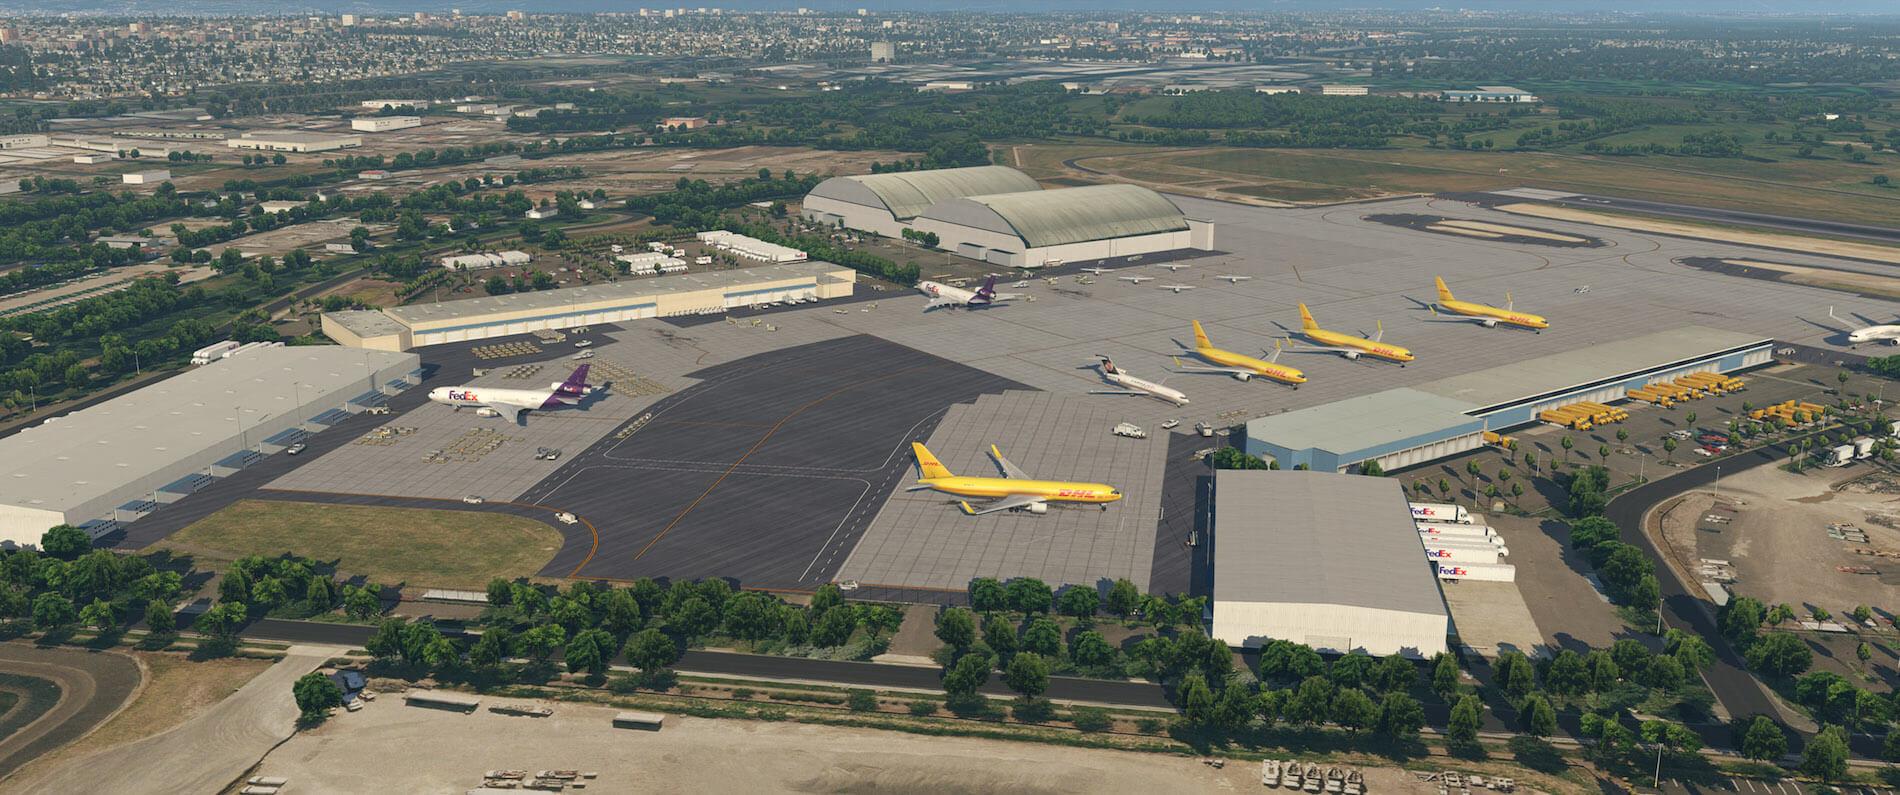 KPDX | Portland International Airport for X-Plane 11 | X